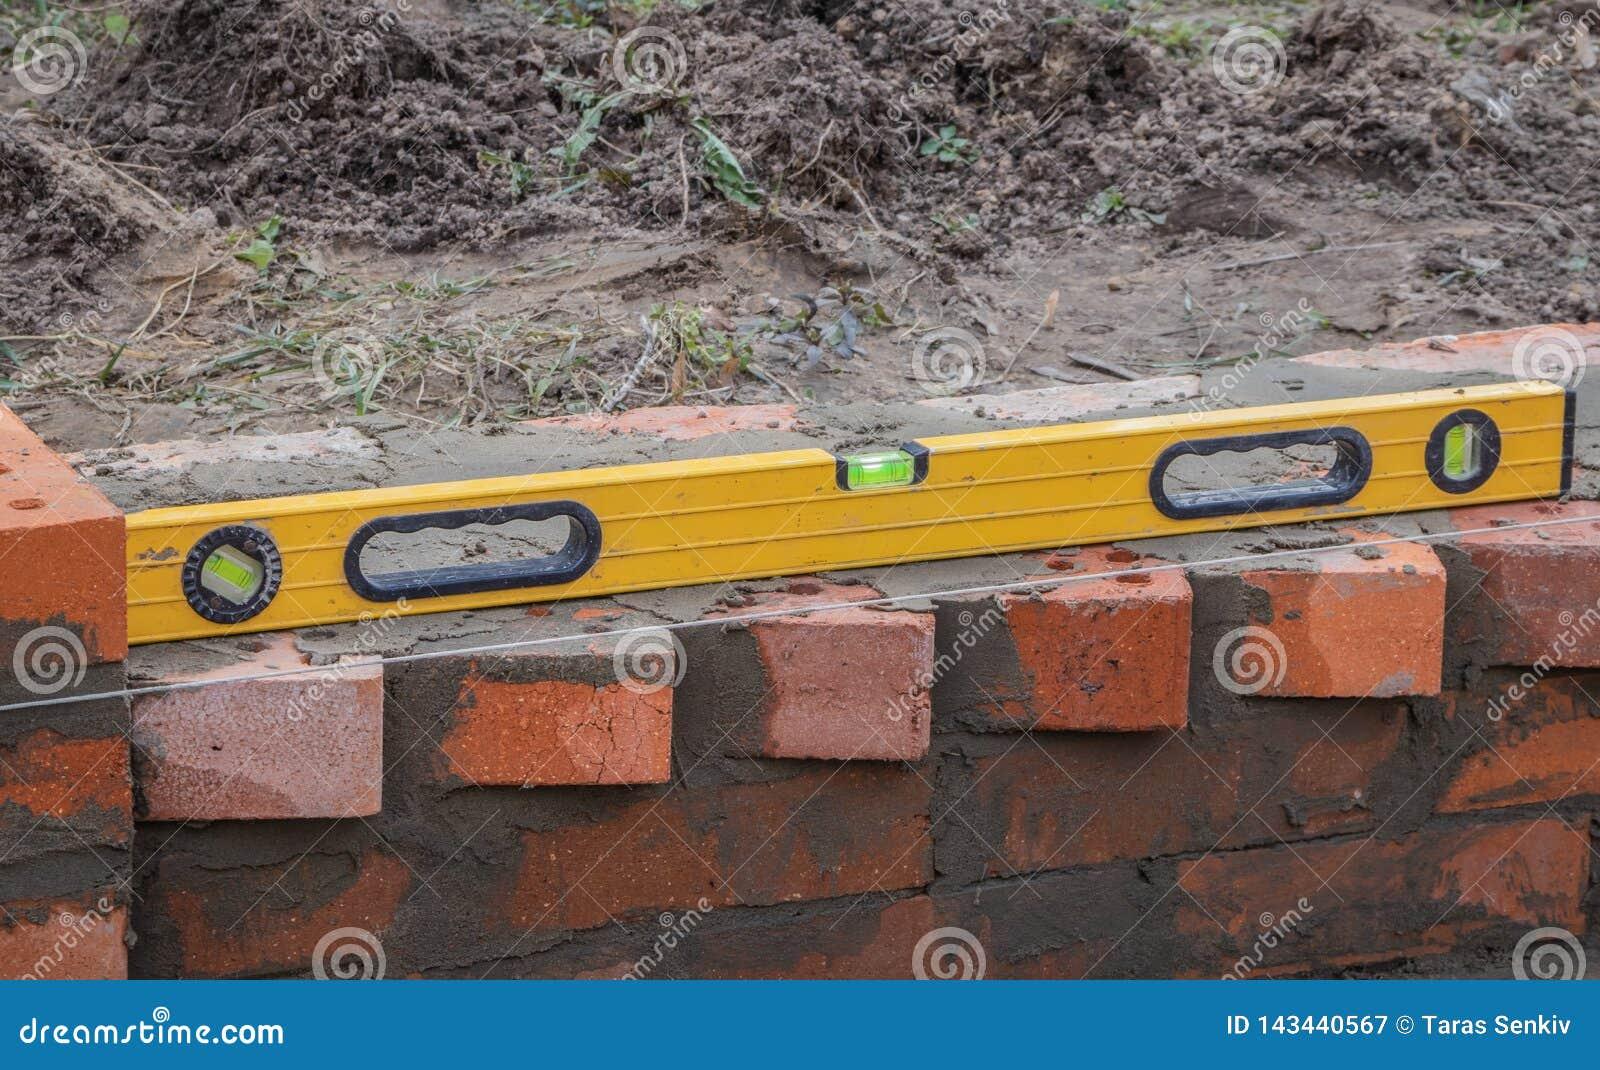 Metselwerk en hulpmiddelen, niveau die, troffel, een huis bouwen